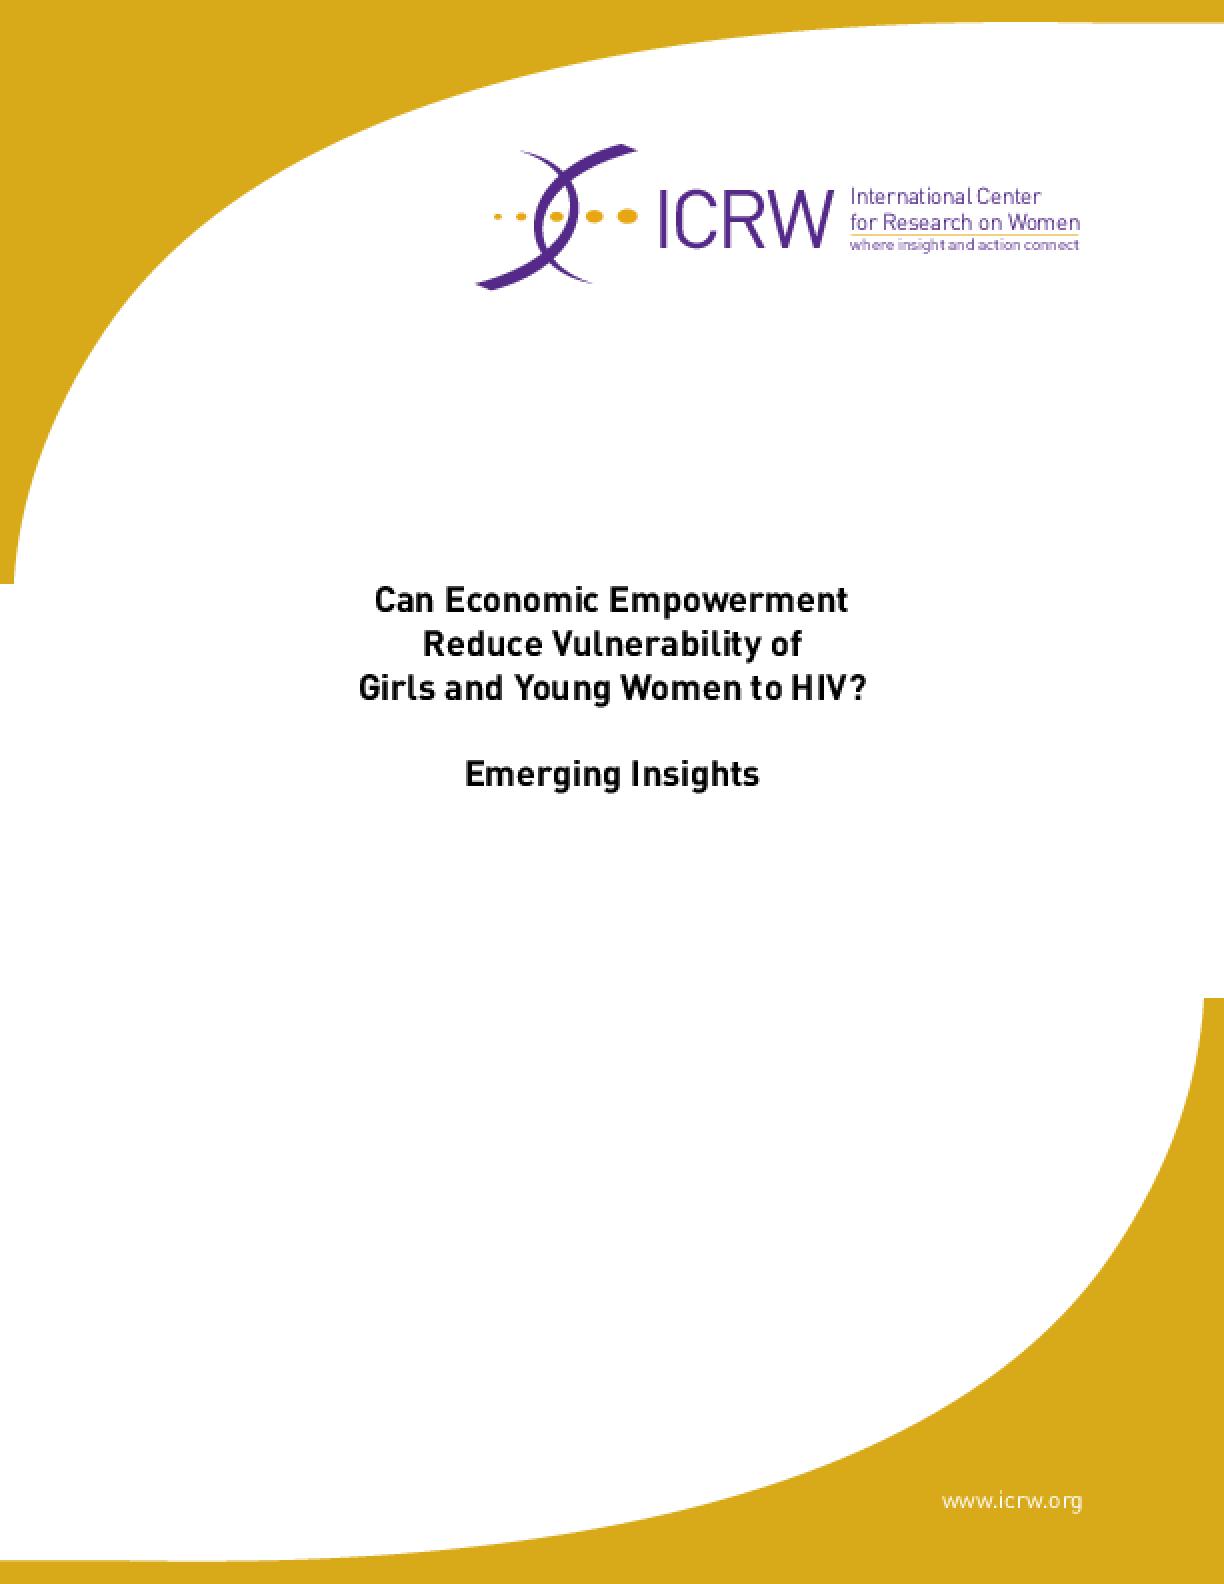 IssueLab: International Center for Research on Women (ICRW)